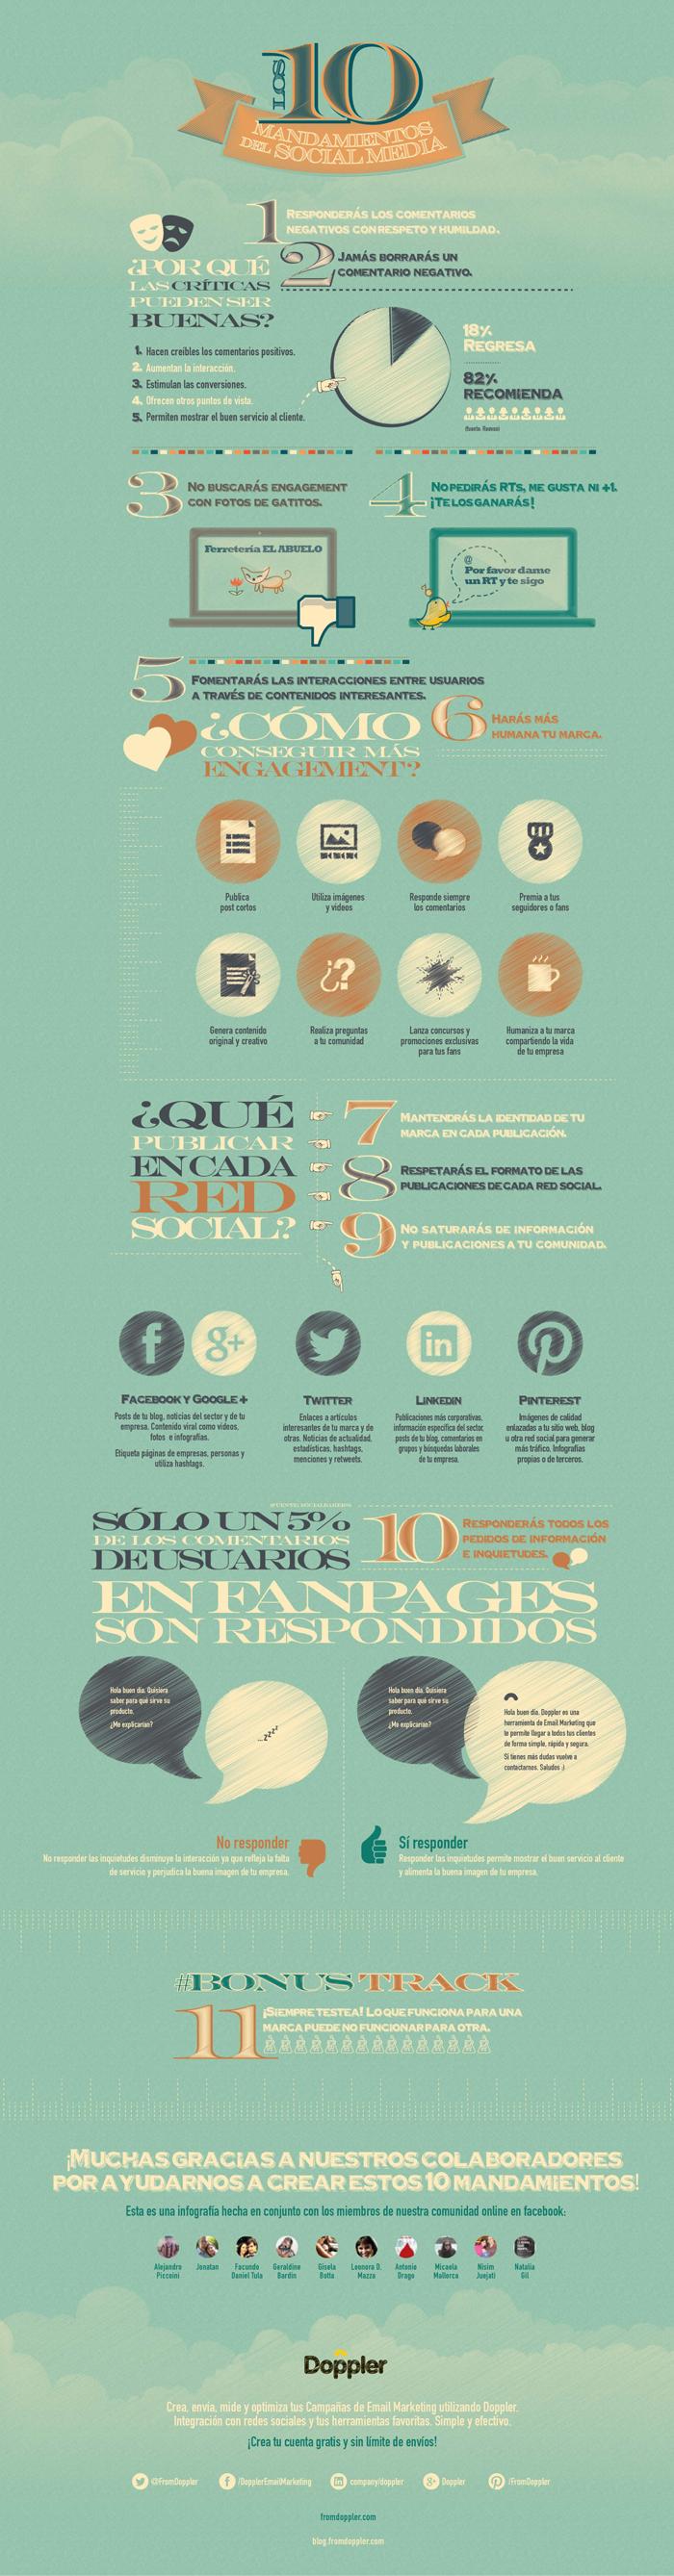 mandamientos_social_media